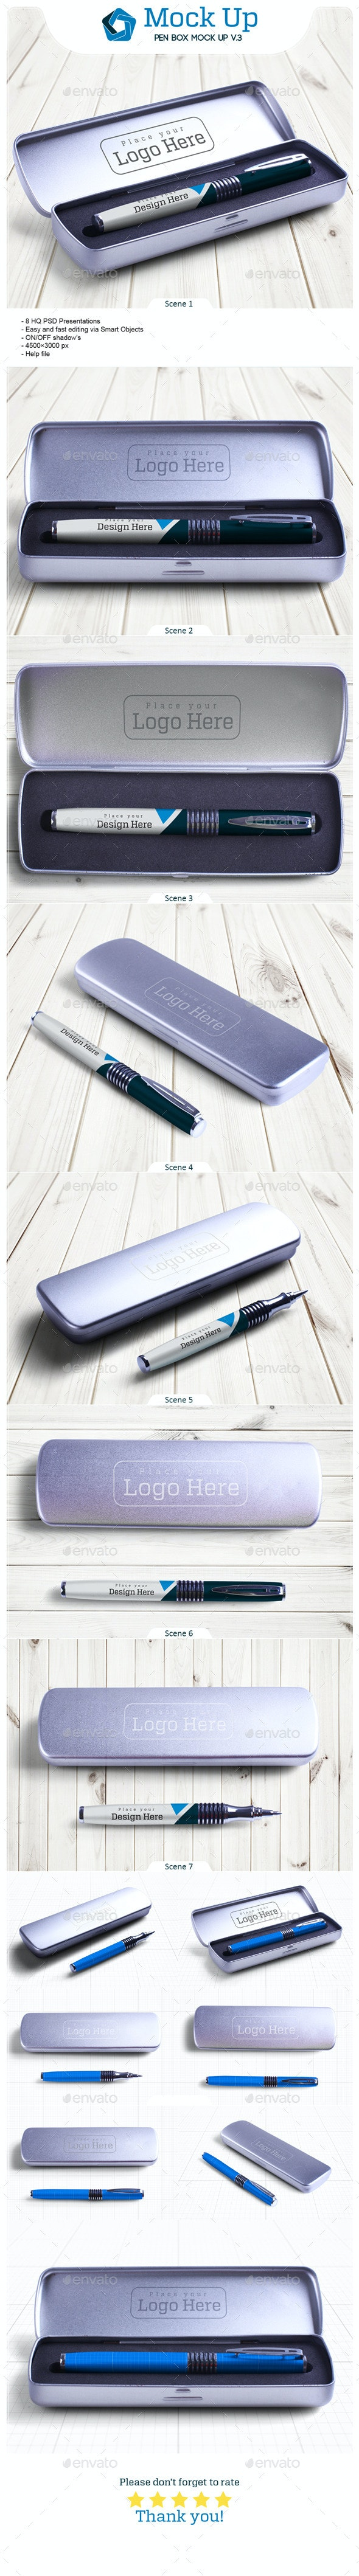 Pen Box Mock Up V.3 - Miscellaneous Product Mock-Ups